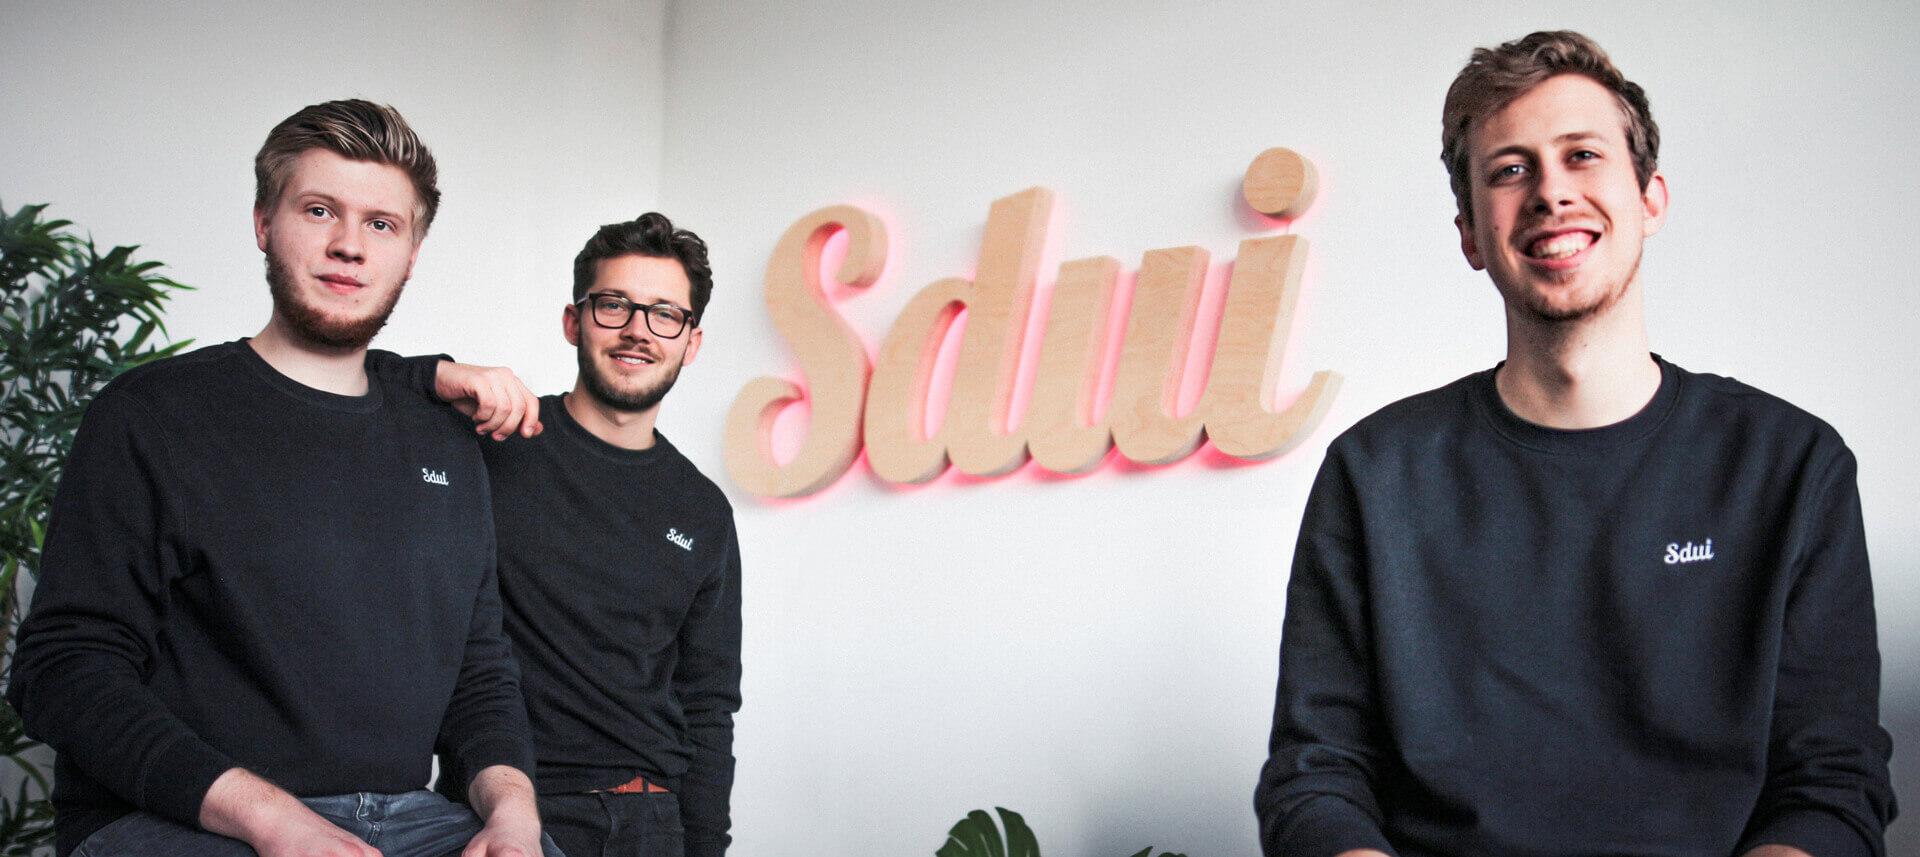 Team Sdui - HTGF Start-up Investment